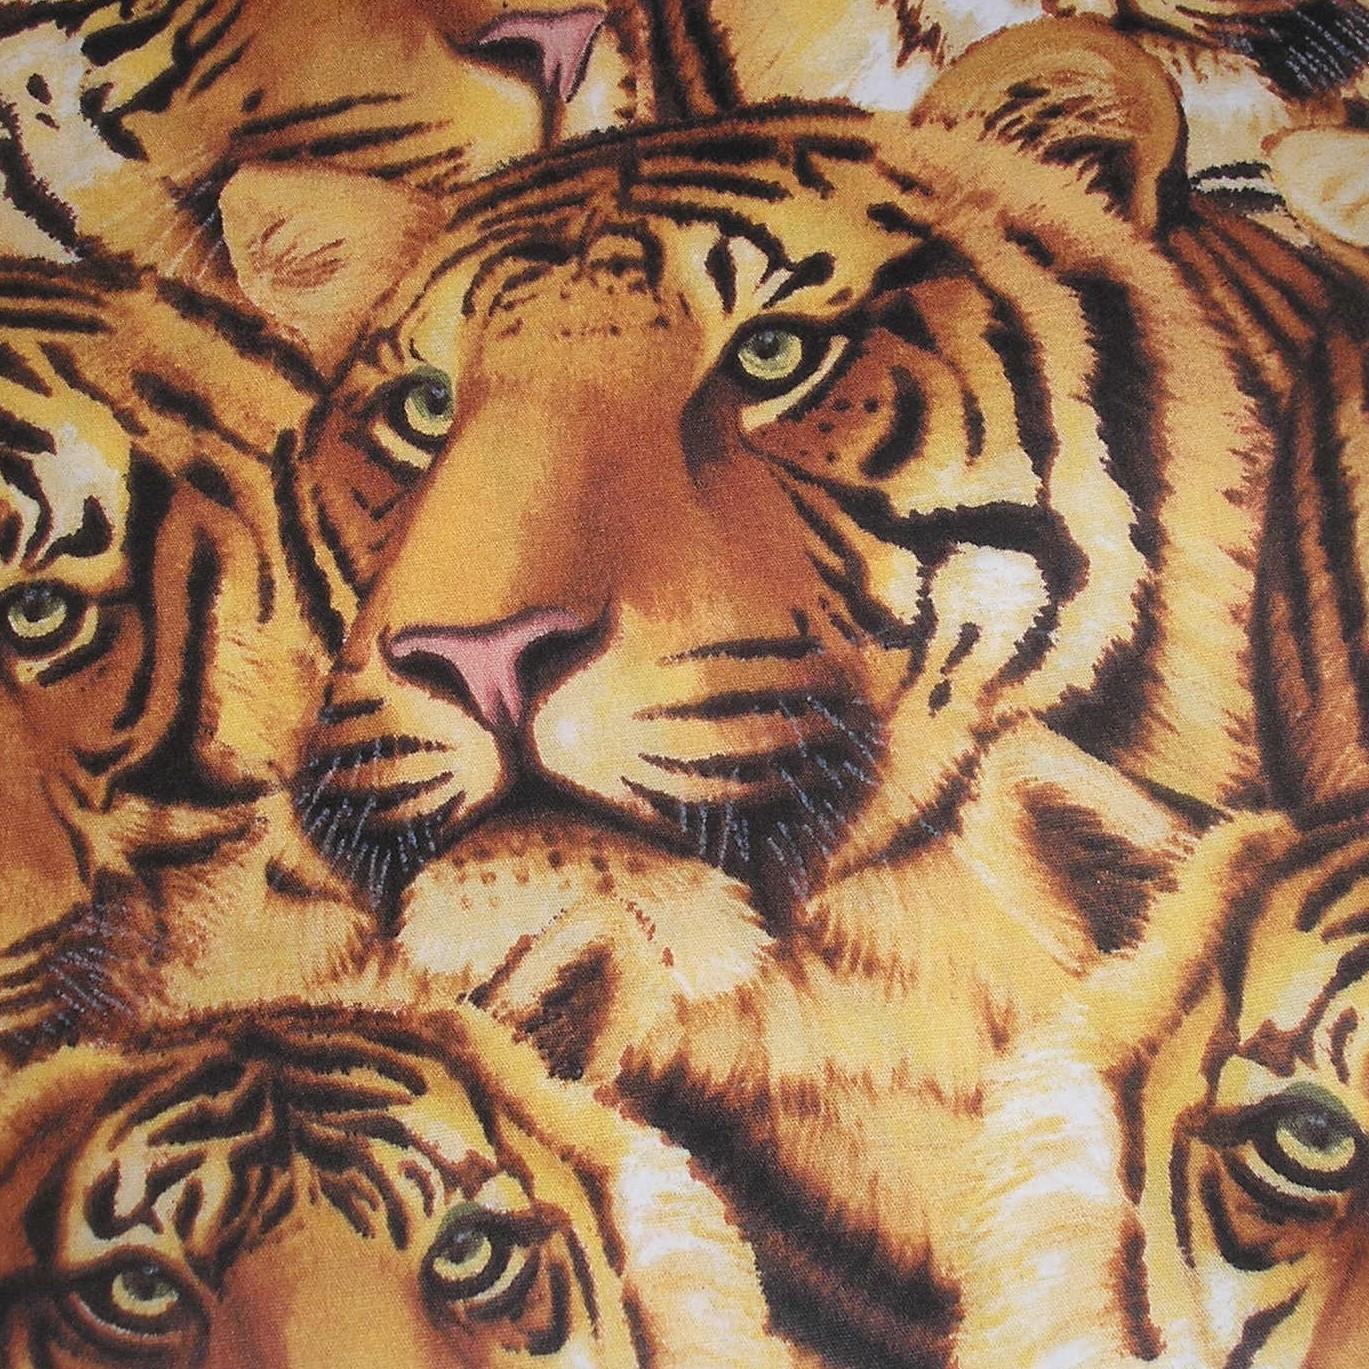 tiger faces